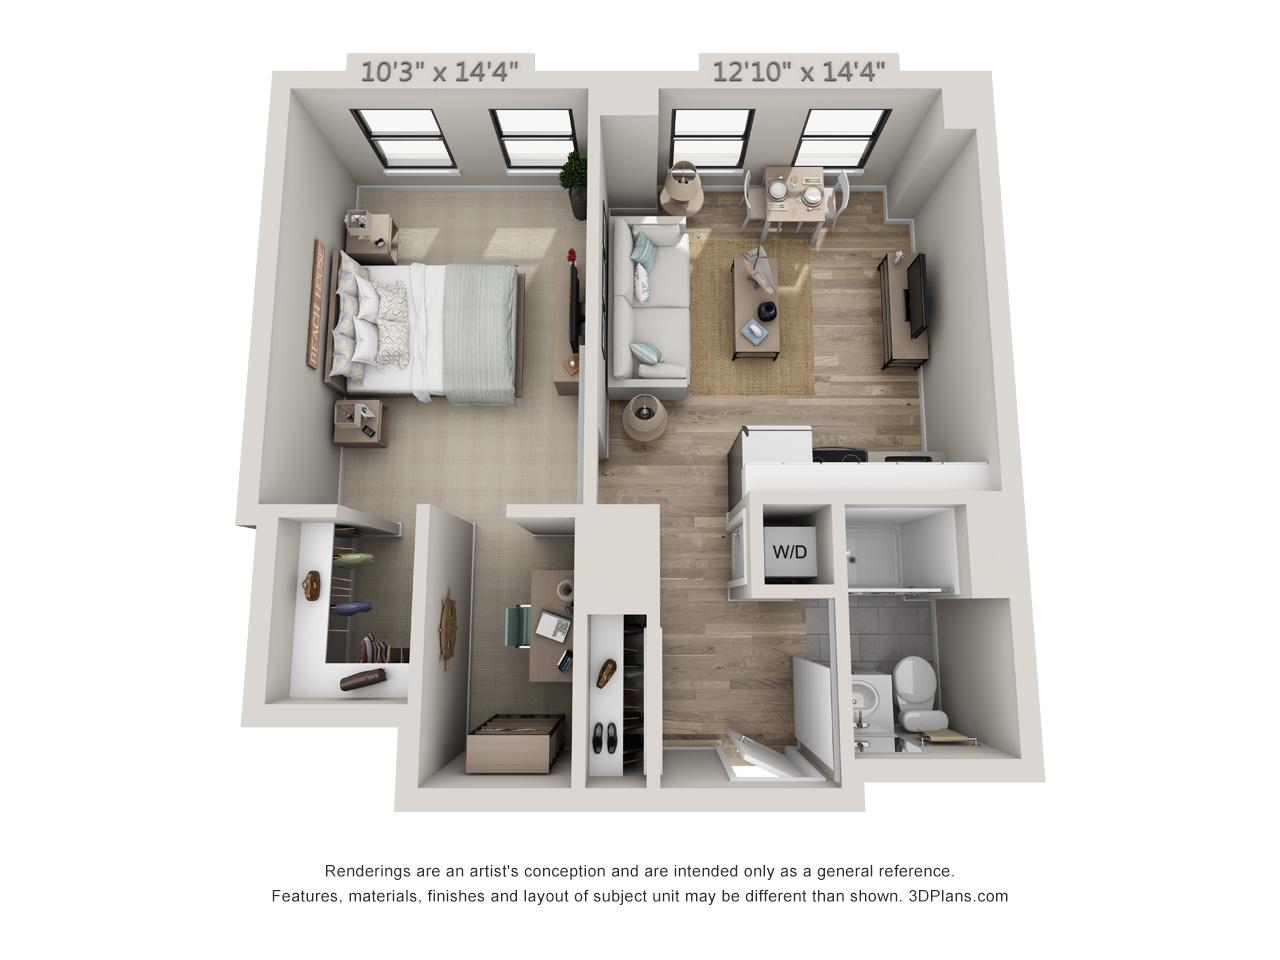 Groovy Apartments In Center City Philadelphia Modern Apartments Interior Design Ideas Gentotryabchikinfo